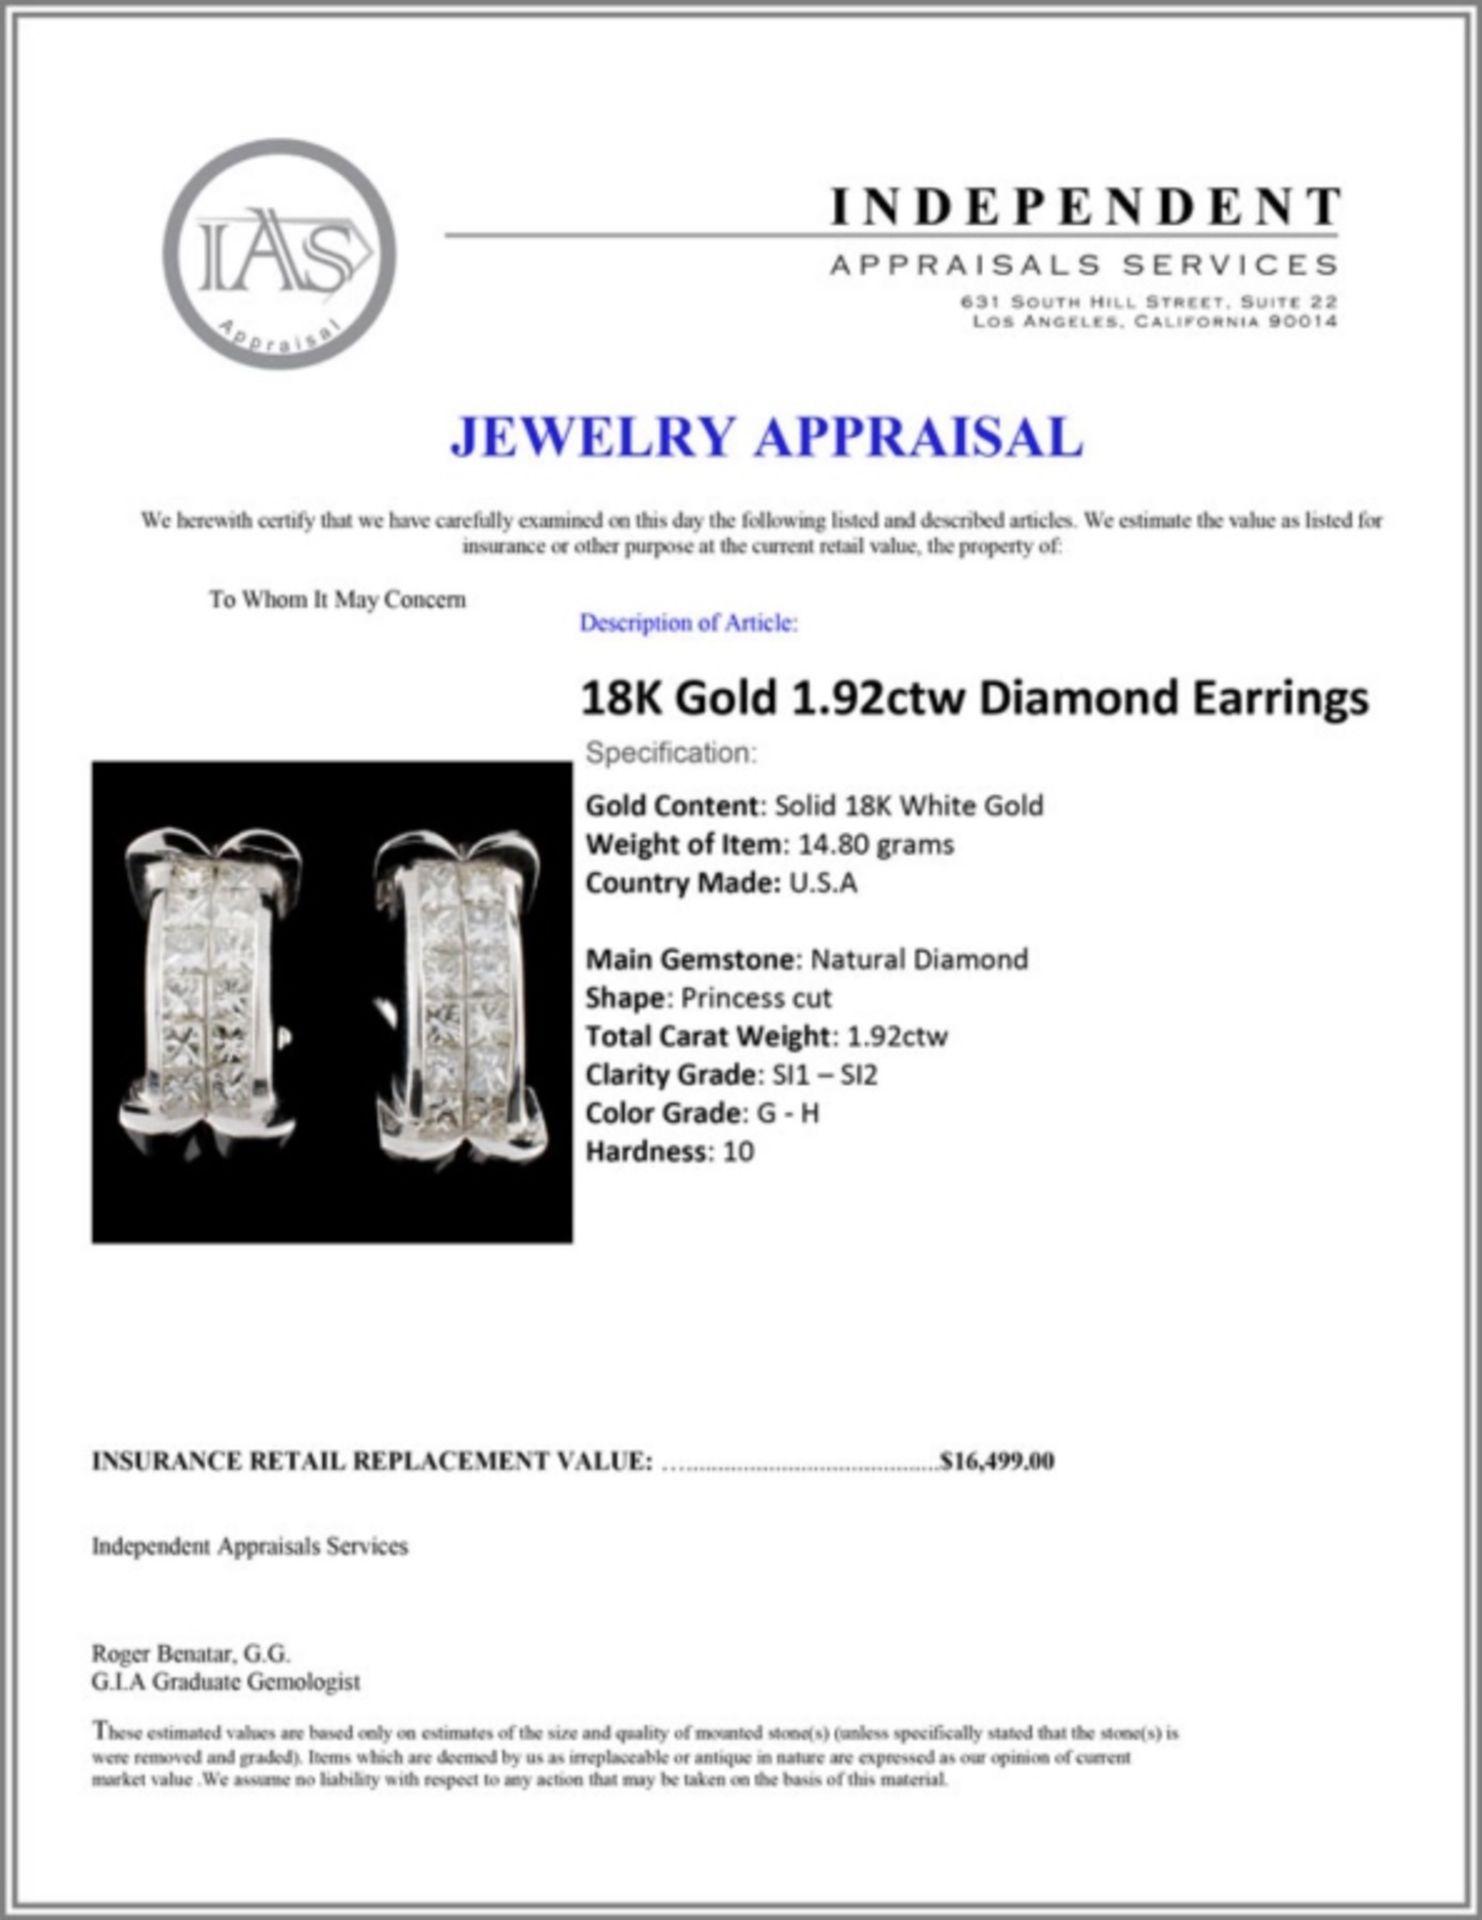 18K Gold 1.92ctw Diamond Earrings - Image 3 of 3